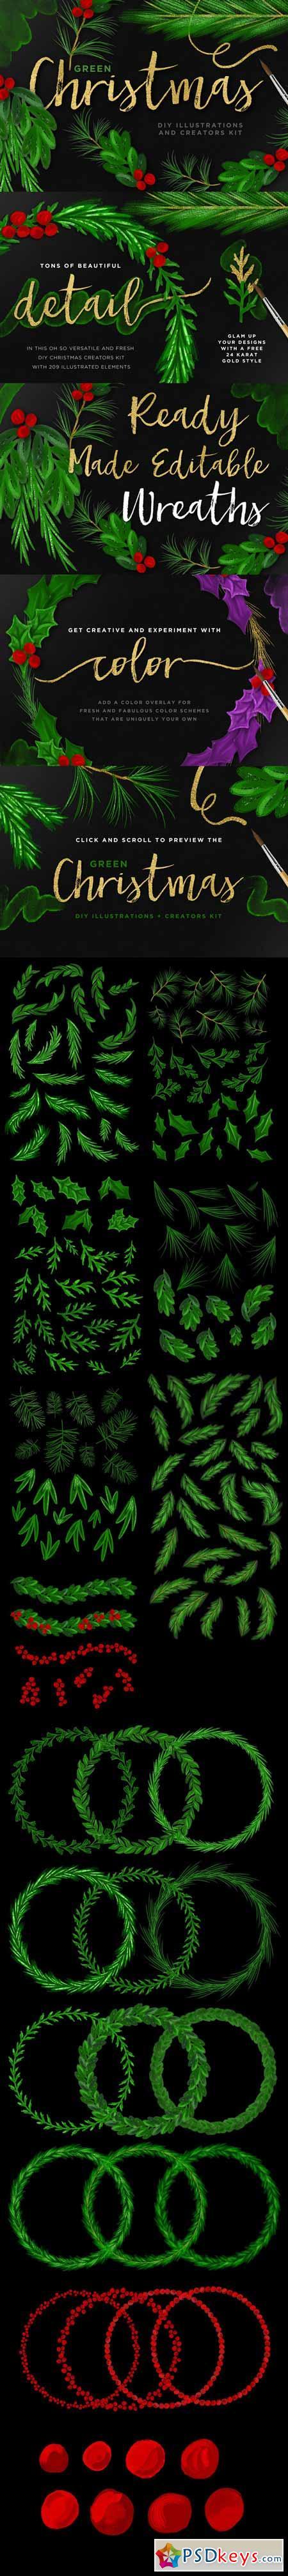 Green Christmas DIY Creator Kit + EU 383582